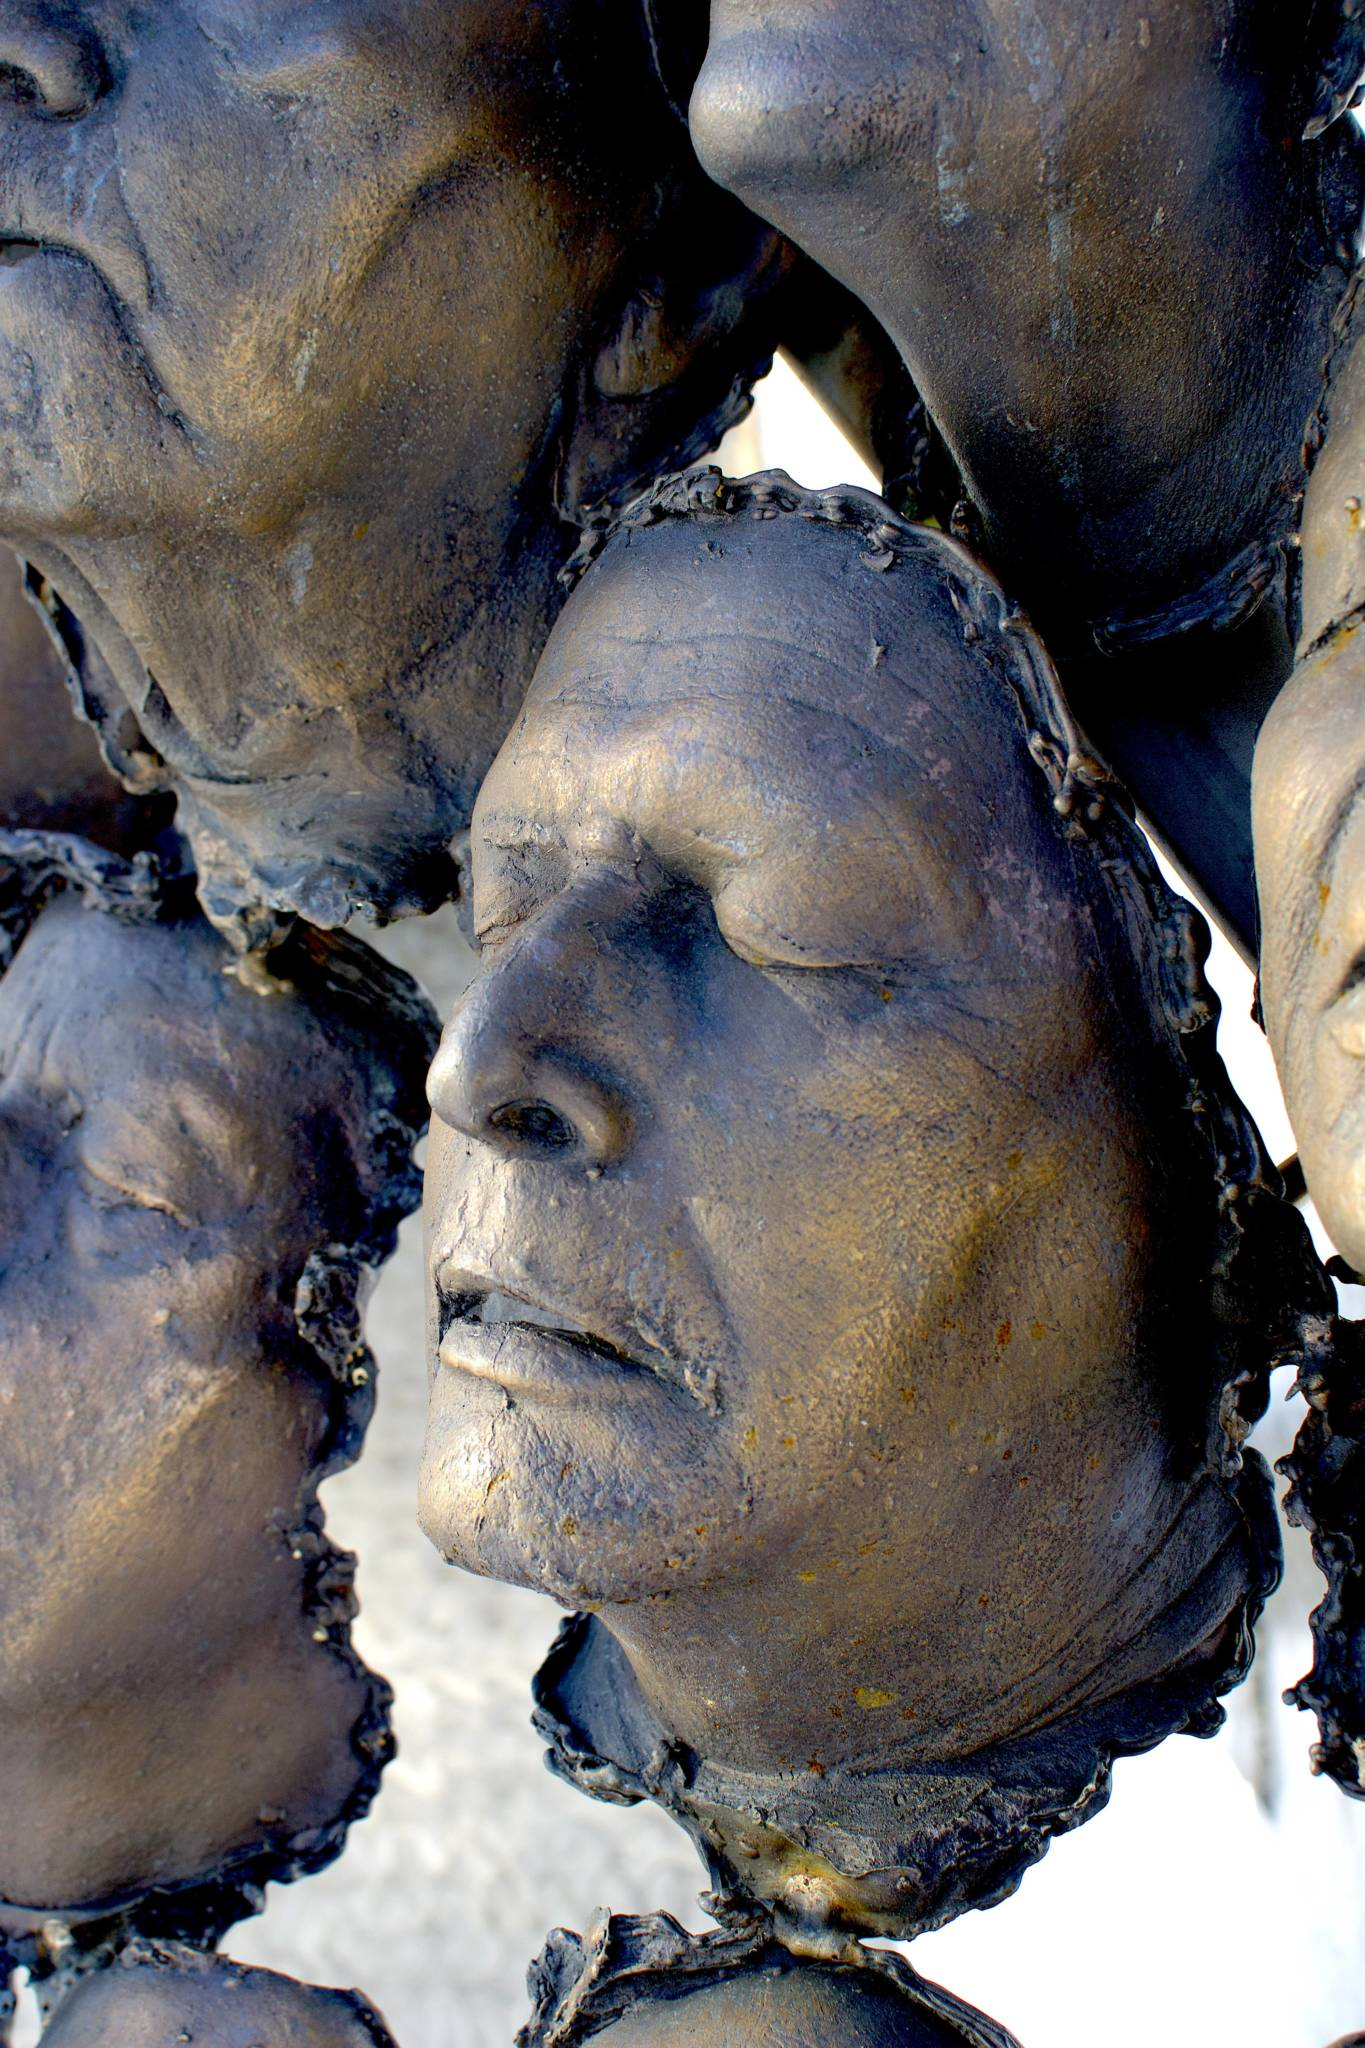 100 Bronze-cast Faces to Commemorate the Centenary of Armistice 4